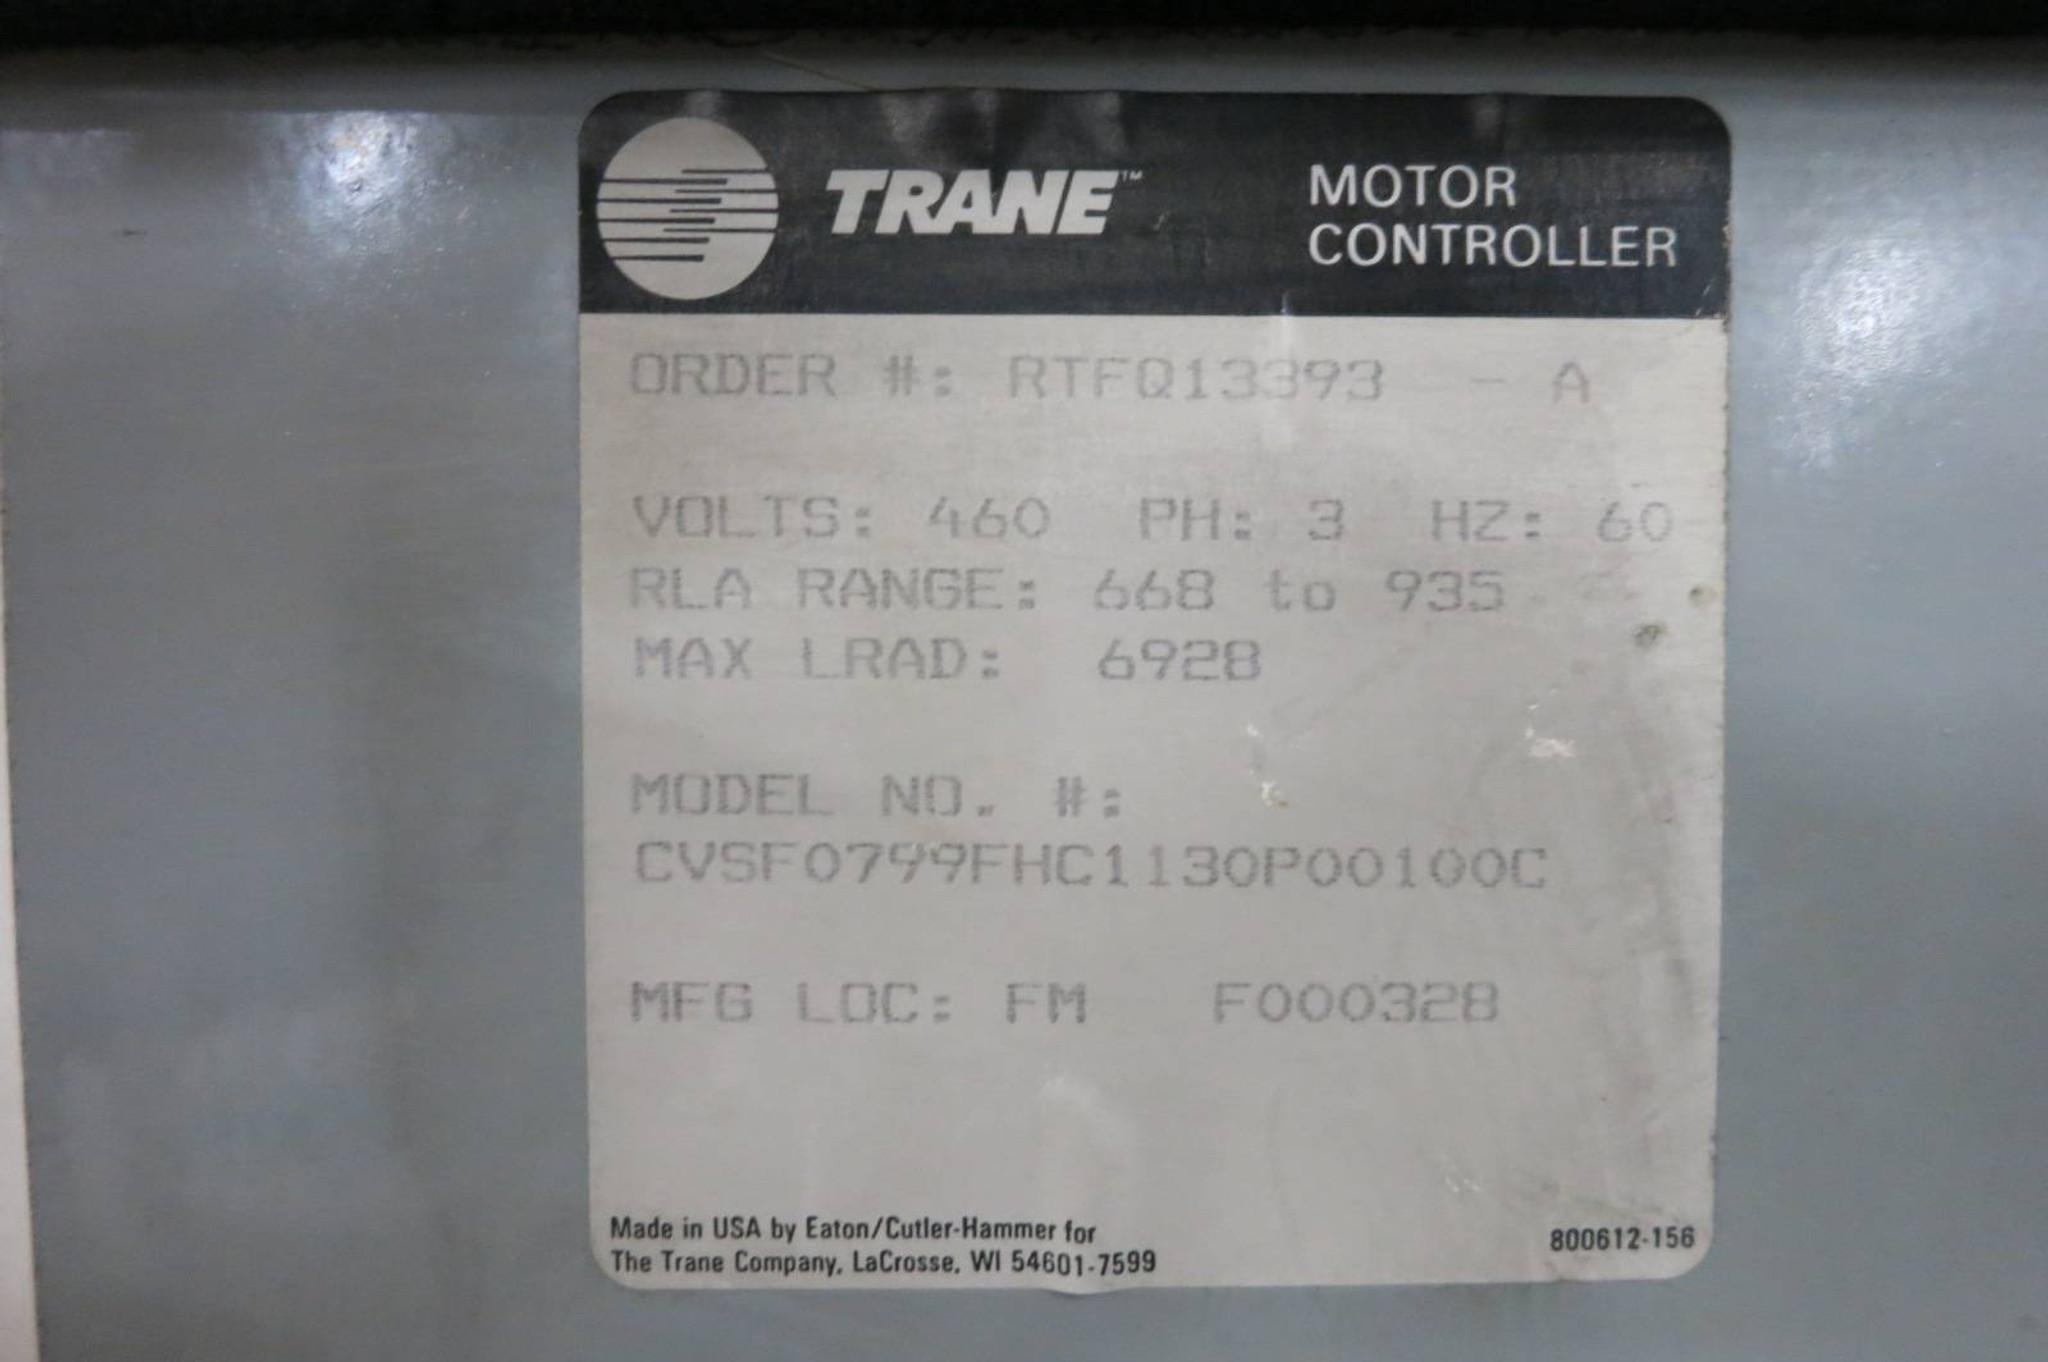 chiller starter wiring diagram trane centravac 460v 668 935rla motor controller wye delta chiller  trane centravac 460v 668 935rla motor